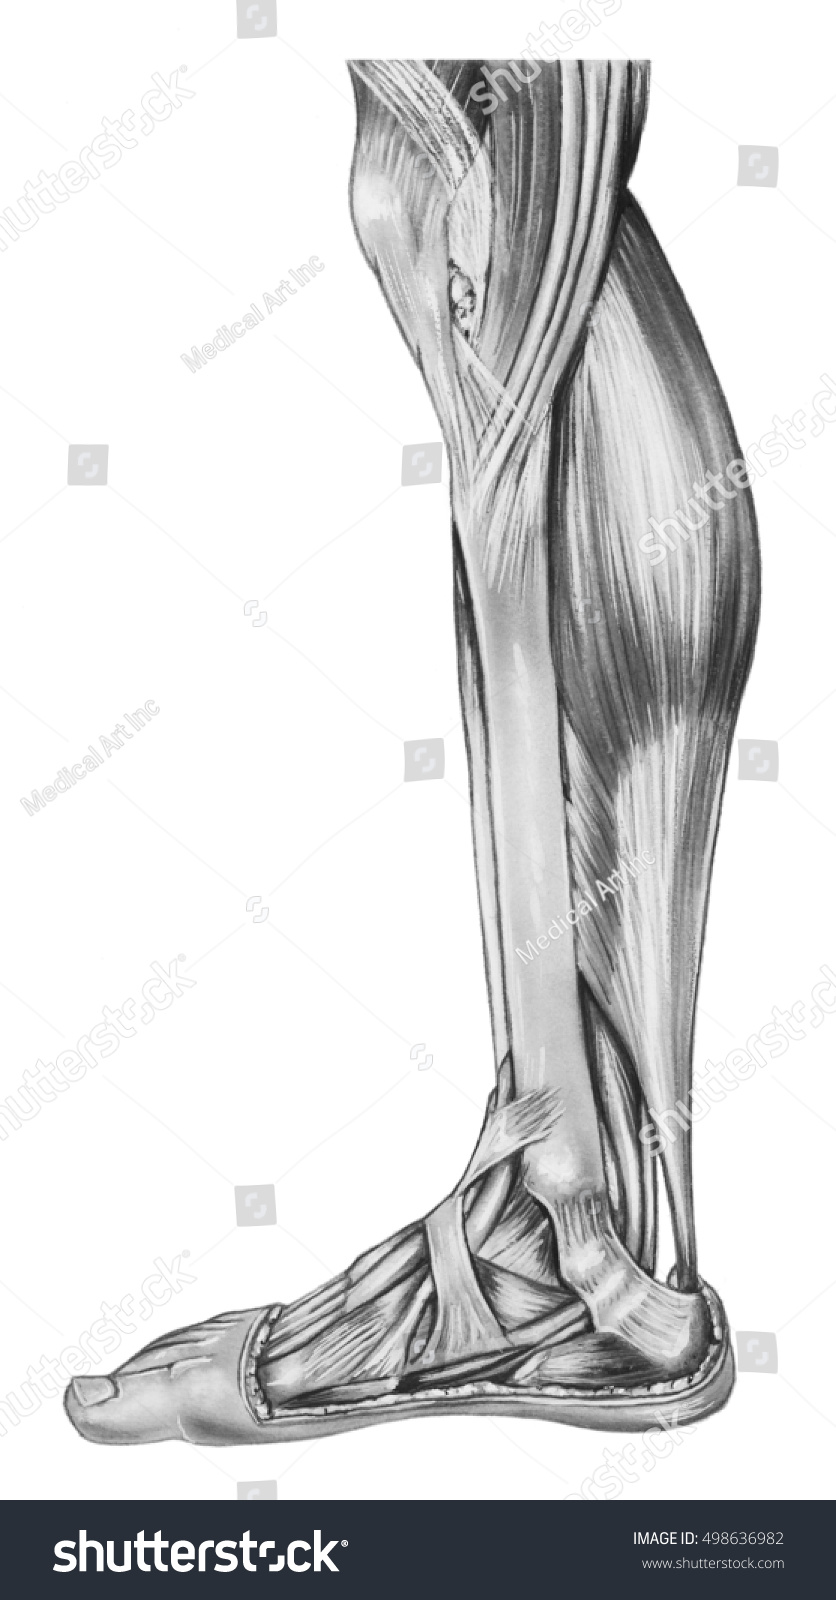 Leg Lower Anatomy Muscles Tendons Human Stock Illustration Royalty